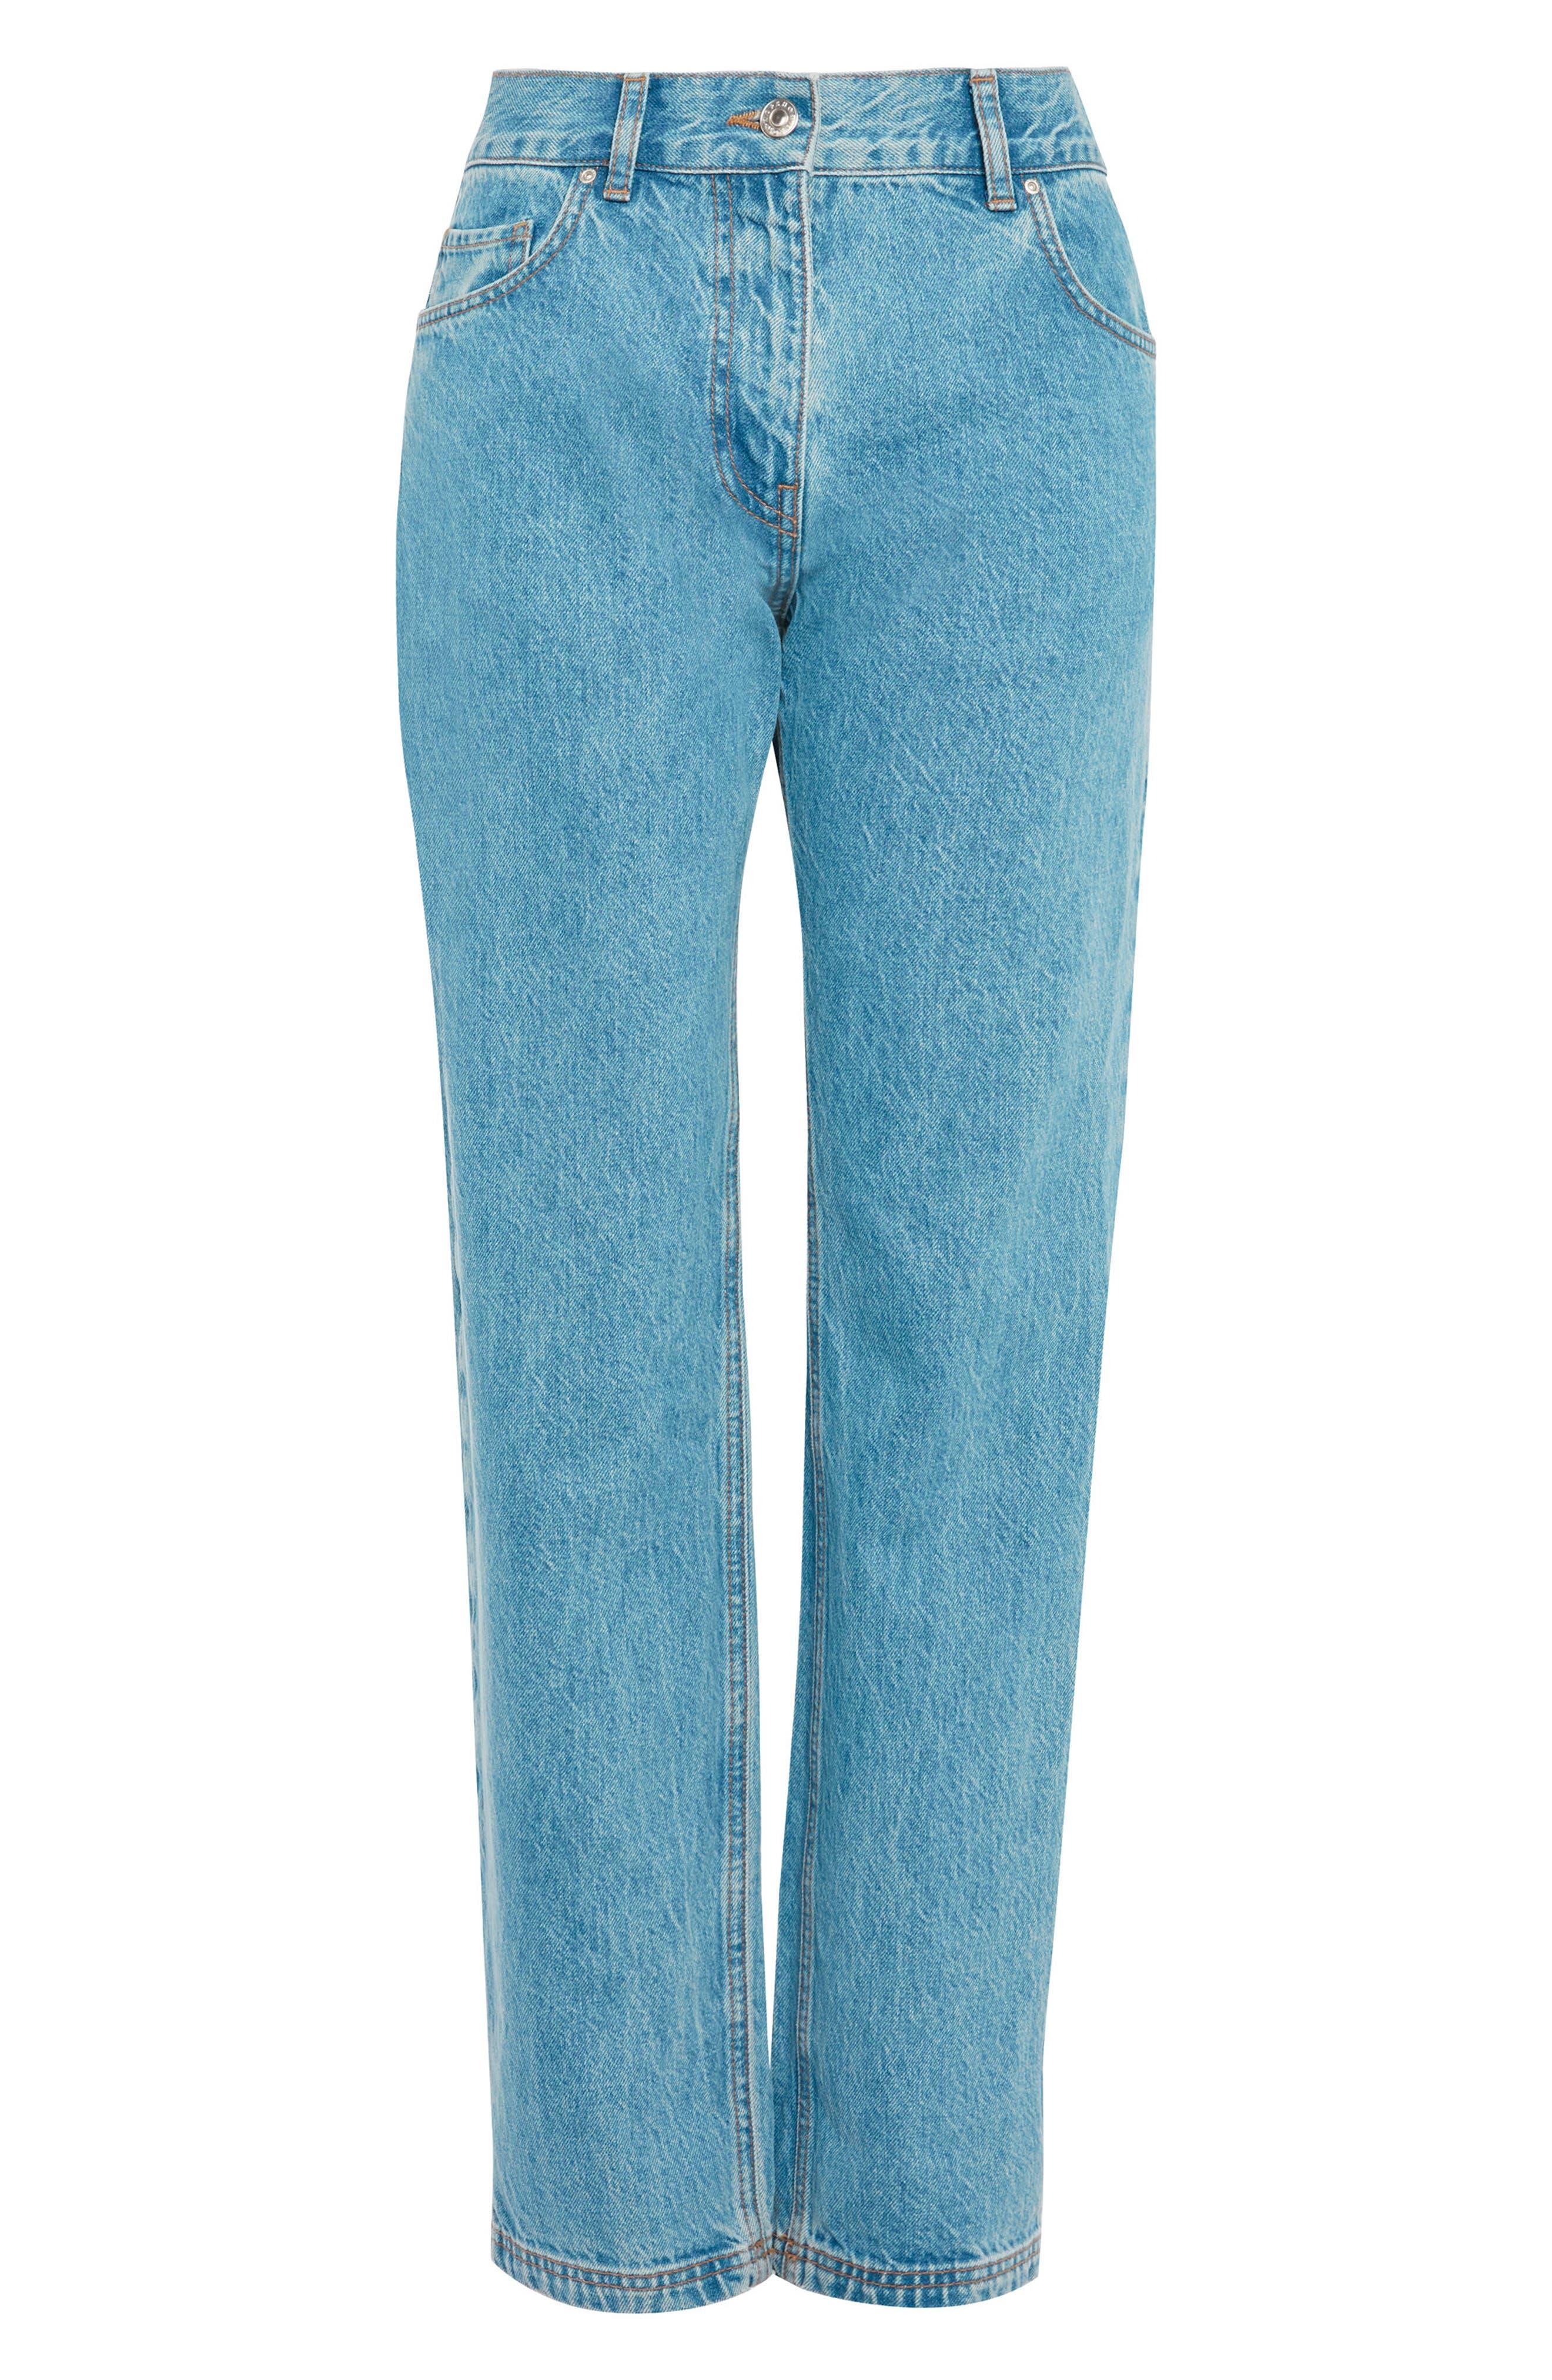 Topshop Light Wash Straight Leg Jeans